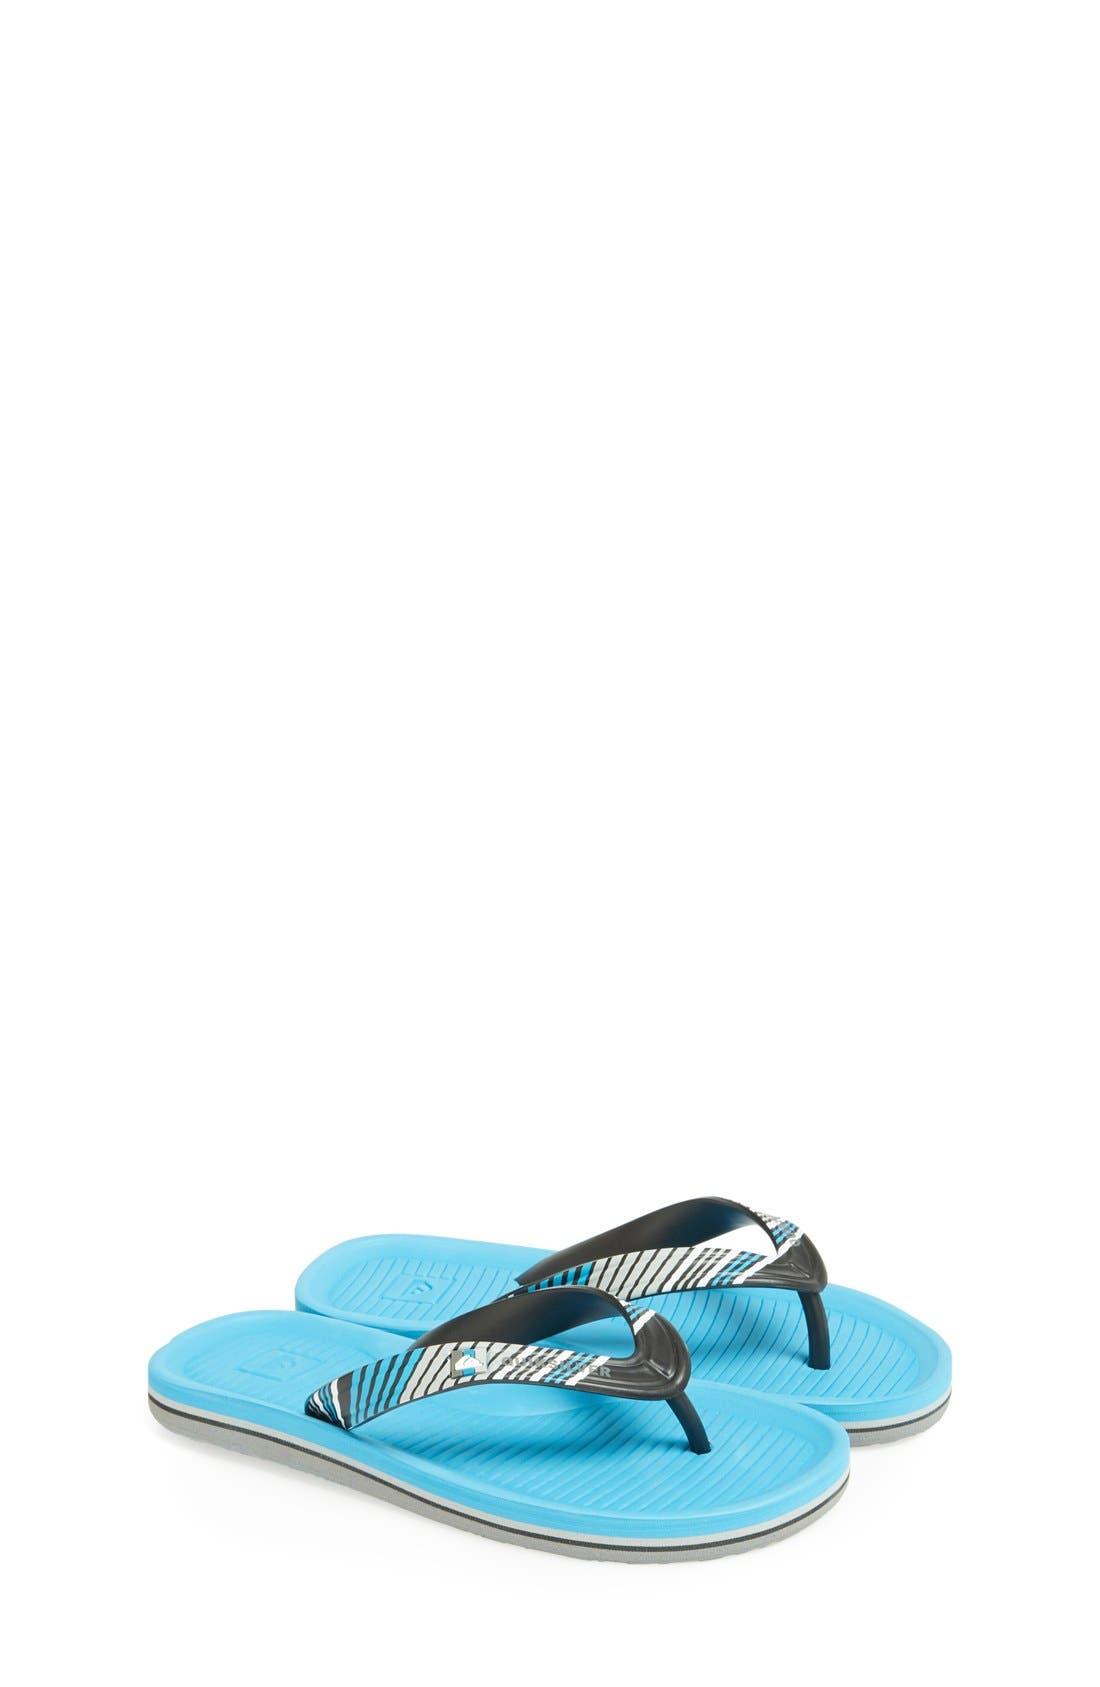 Main Image - Quiksilver 'Haleiwa' Flip Flop (Toddler, Little Kid & Big Kid)